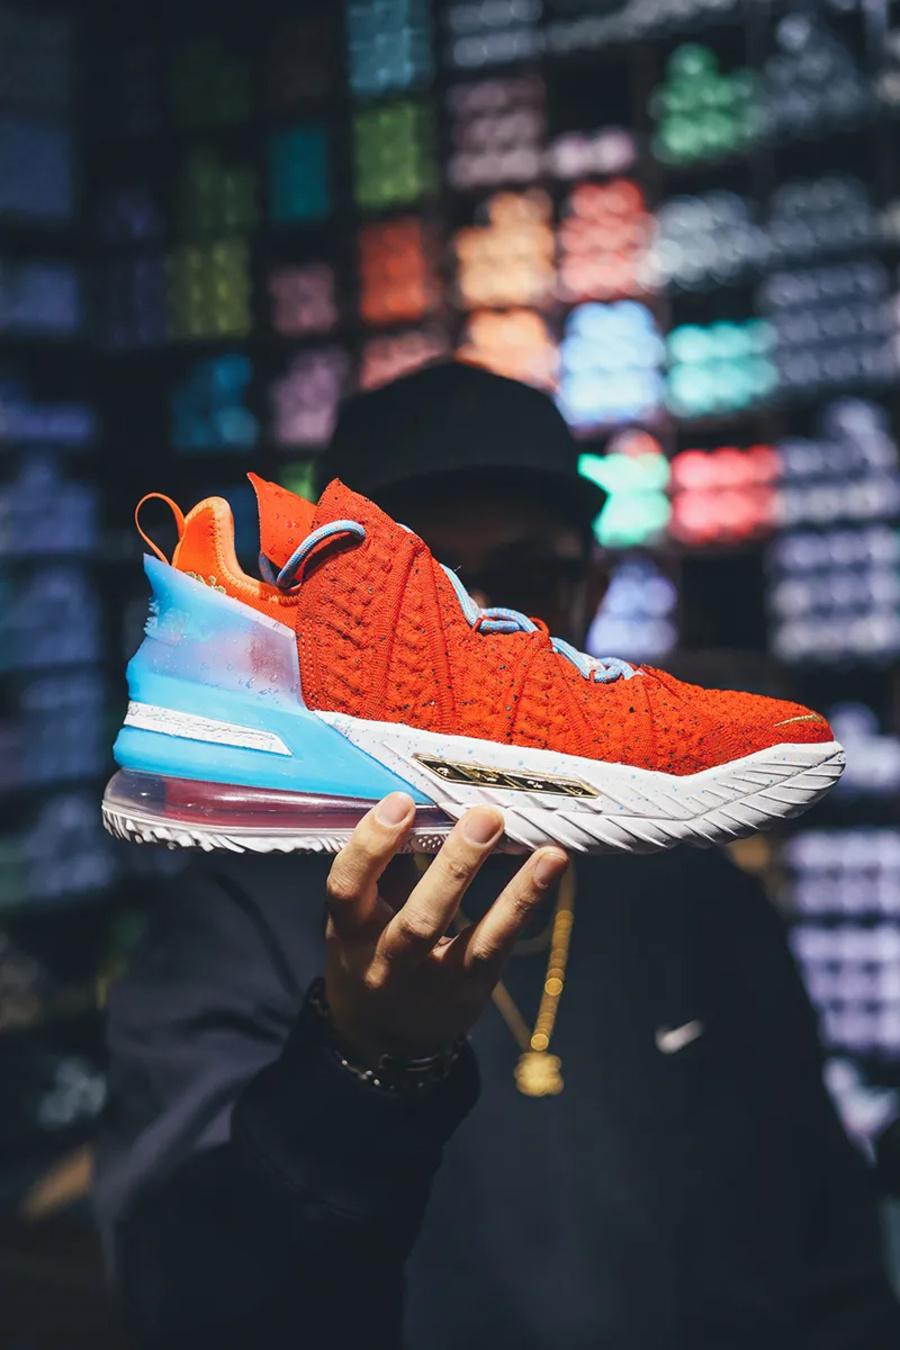 400ml,Nike LeBron 18  Nike 保密程度极高的「神秘新鞋」终于解禁!还有特殊彩蛋曝光!